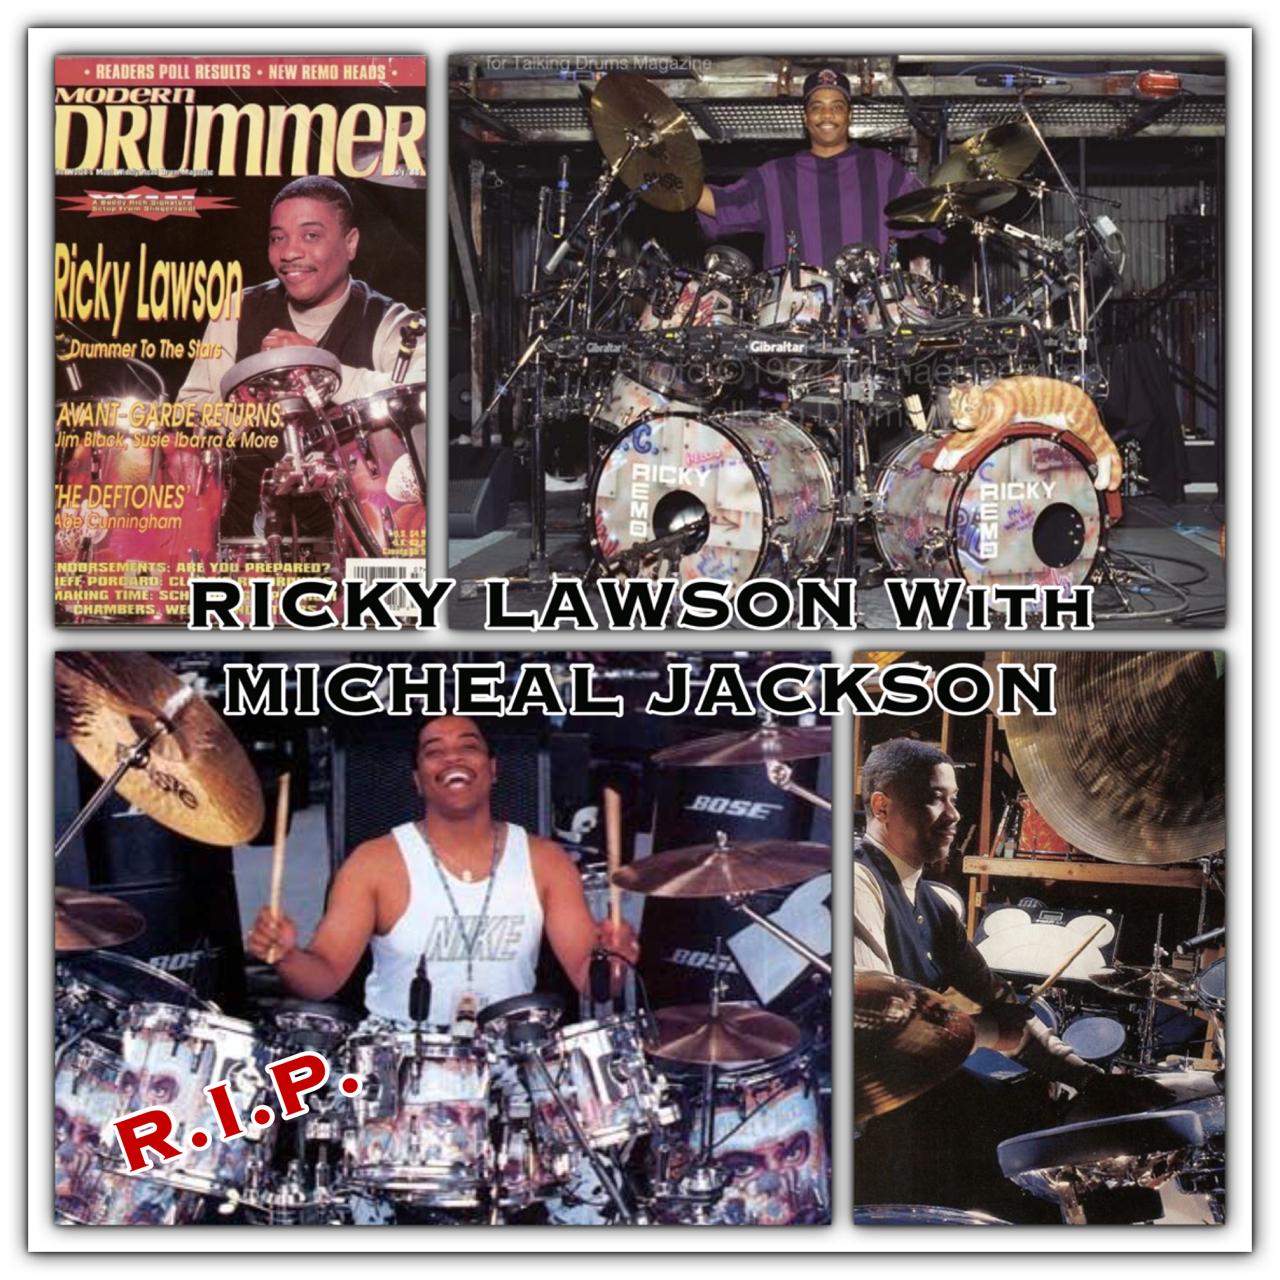 RICKY LAWSON